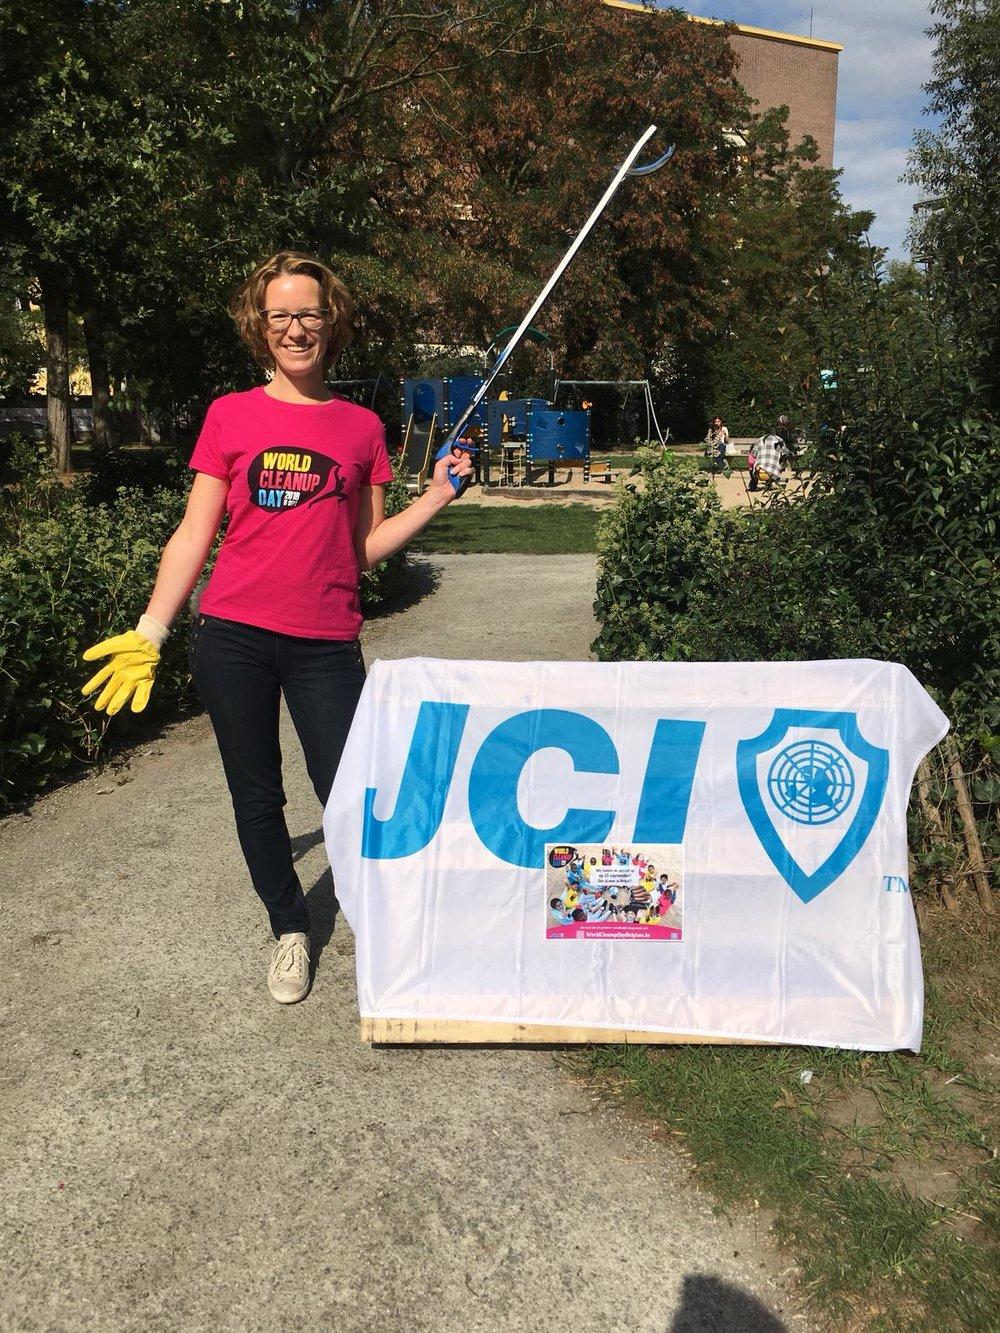 JCIGent WorldCleanupDay 2018 B.jpeg